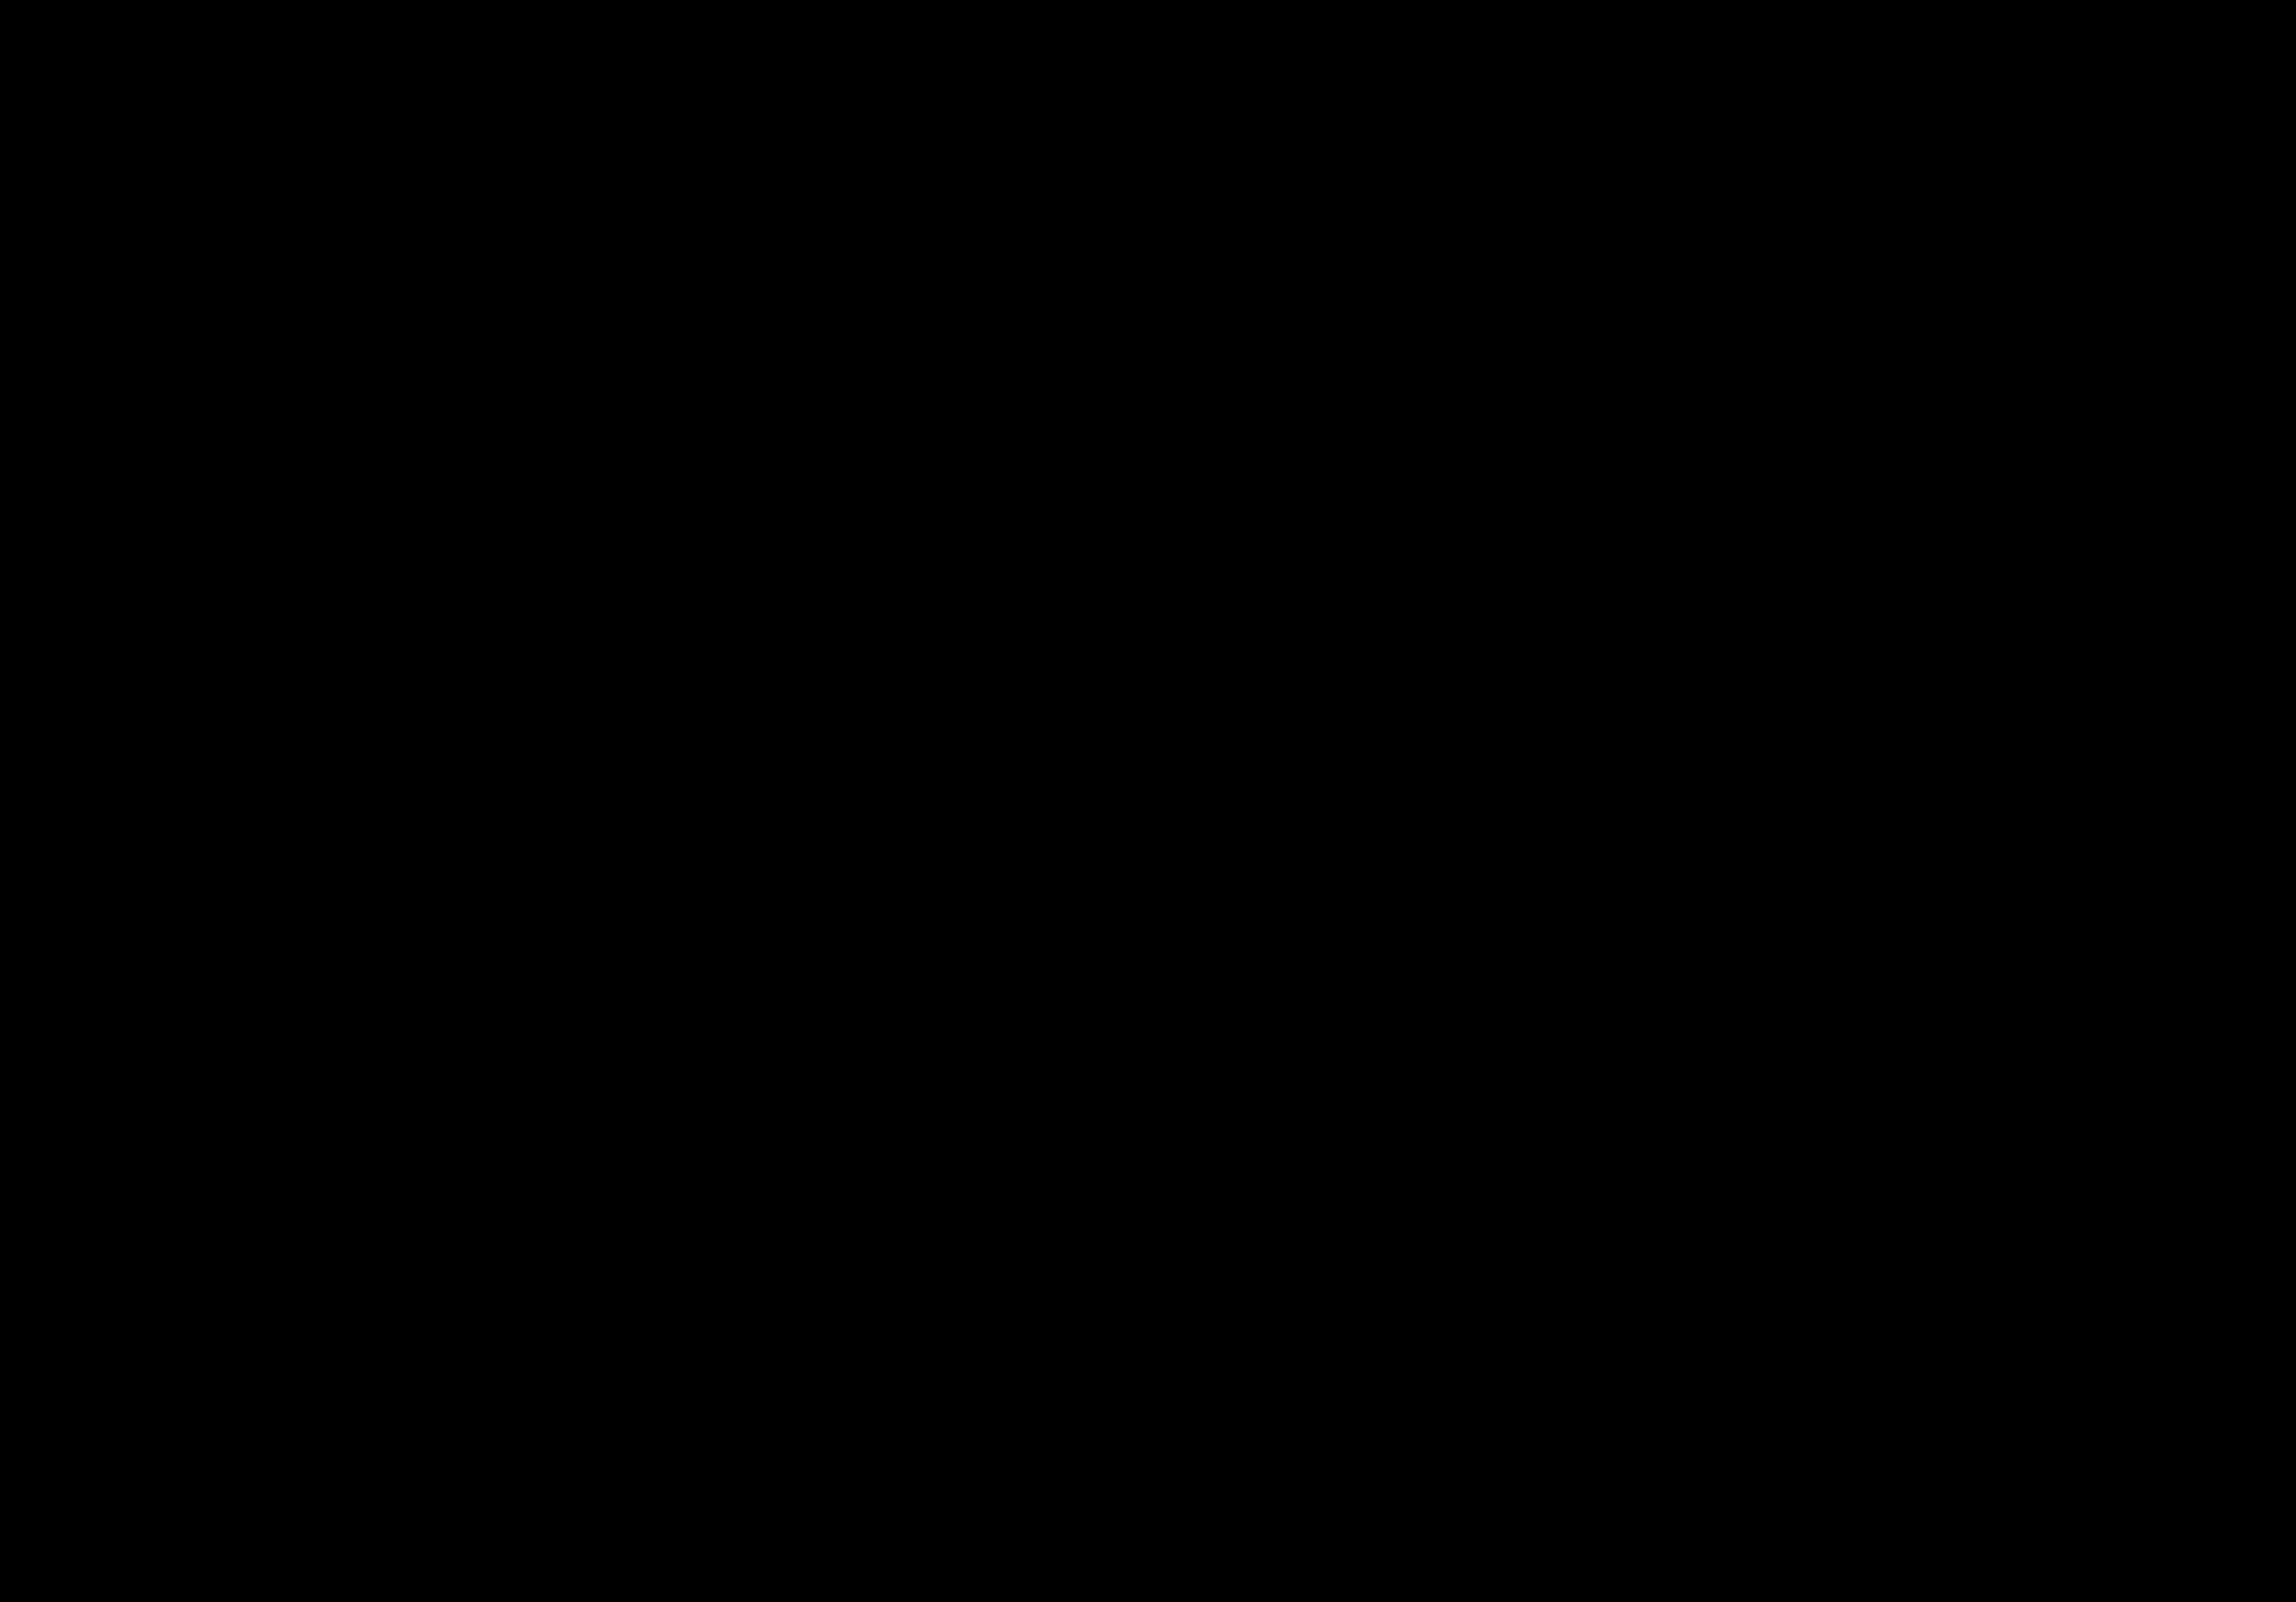 cap logo malvorlage